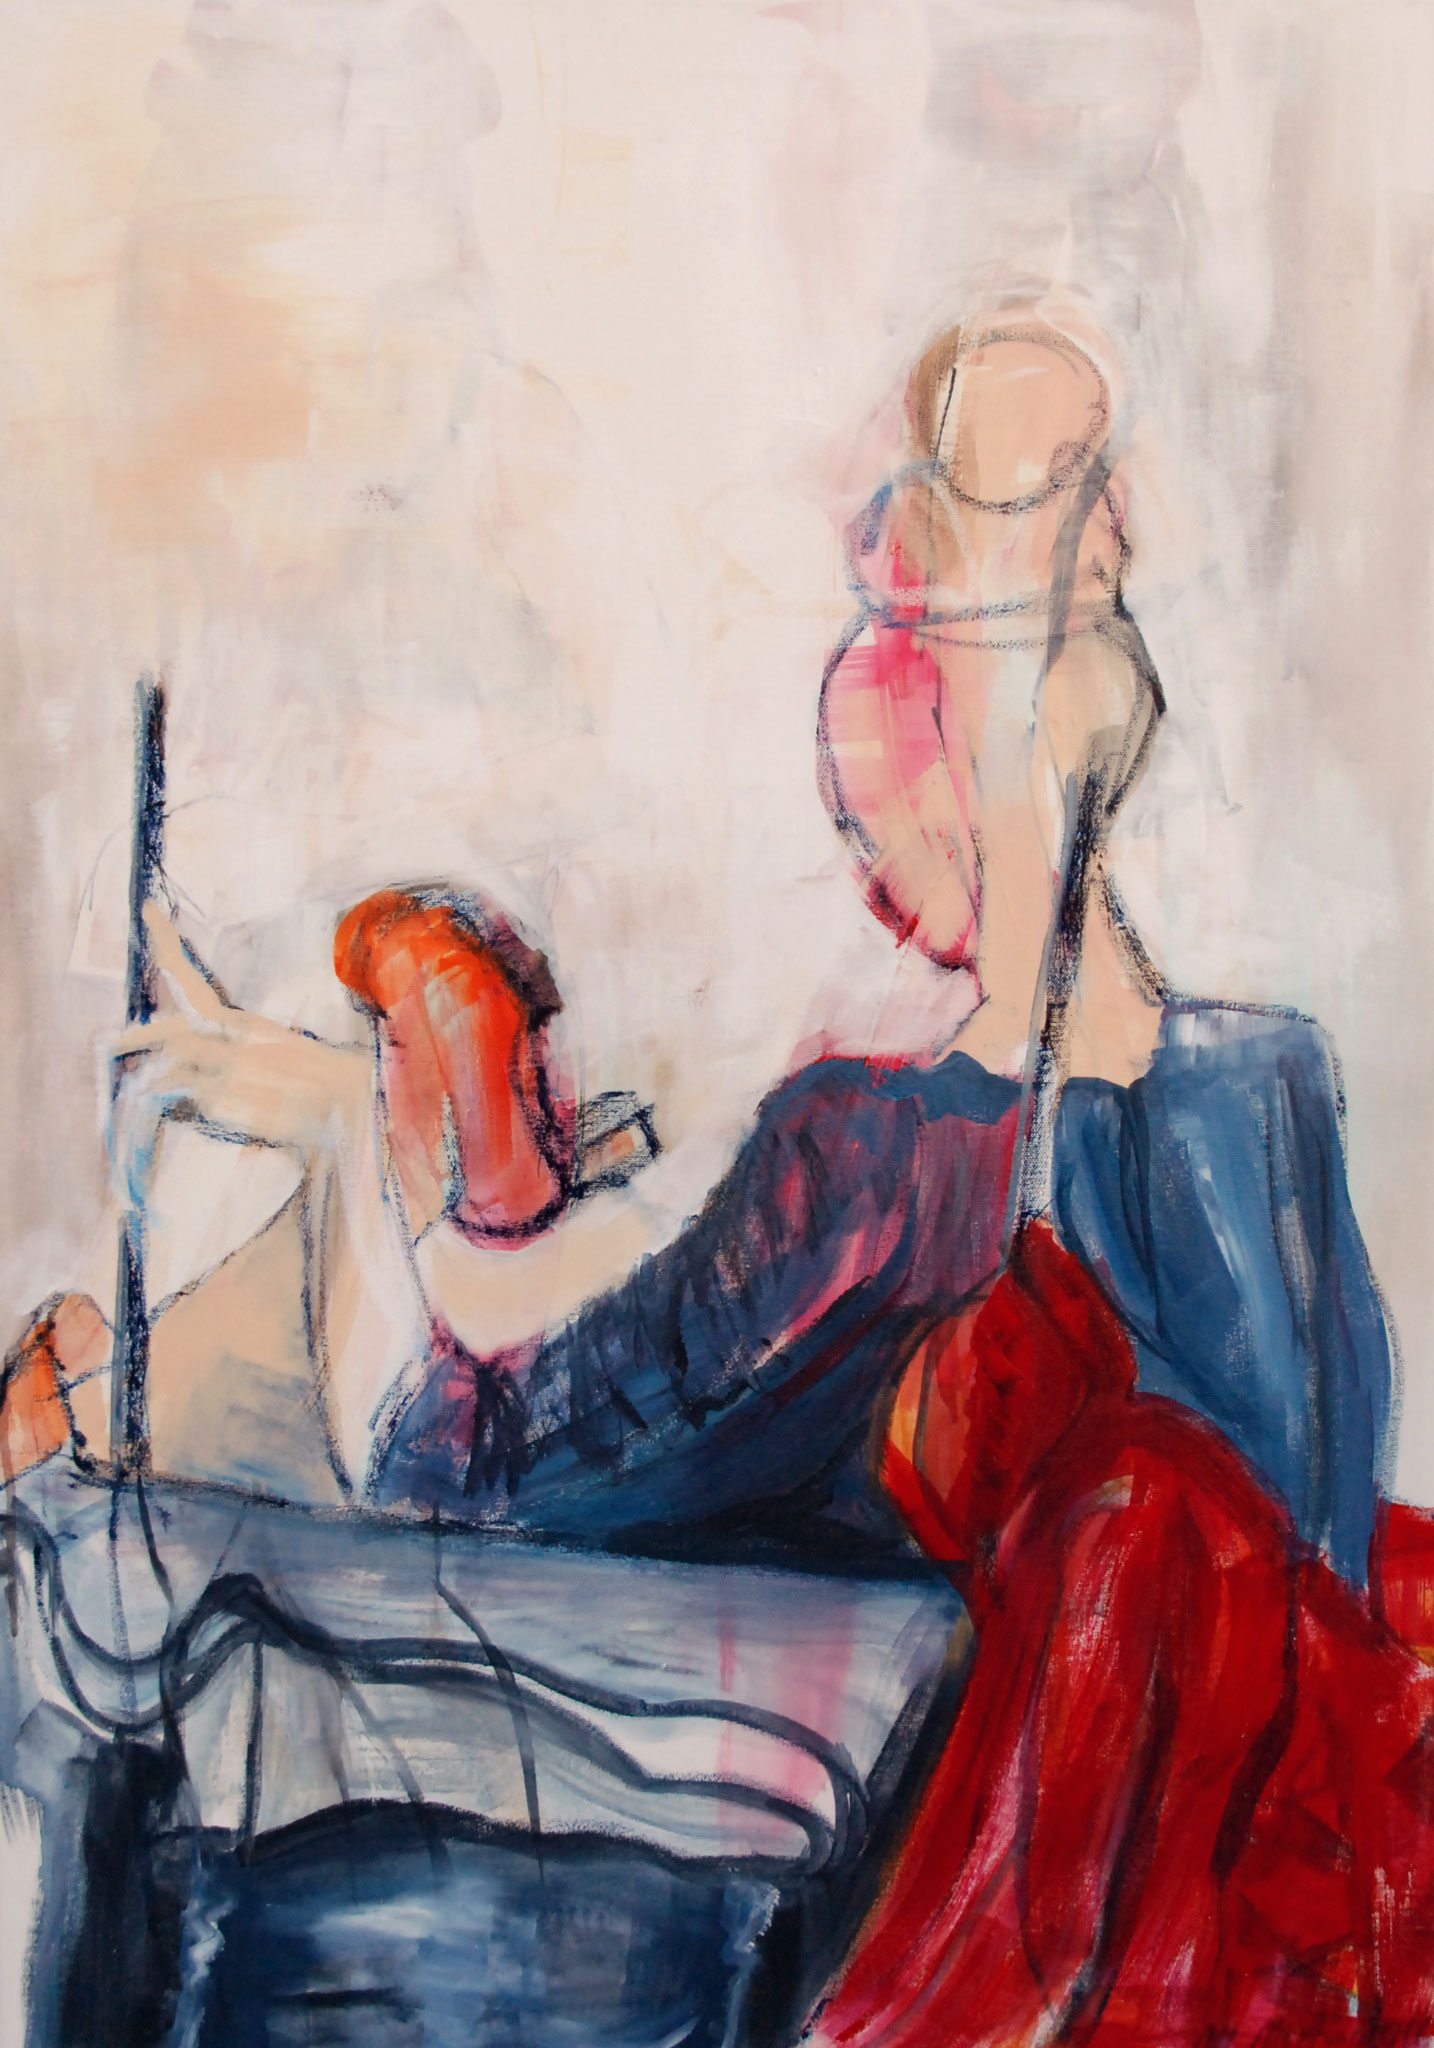 Kristina sitzend, 2016, Mixed Media auf Leinwand, 100cm x 70cm